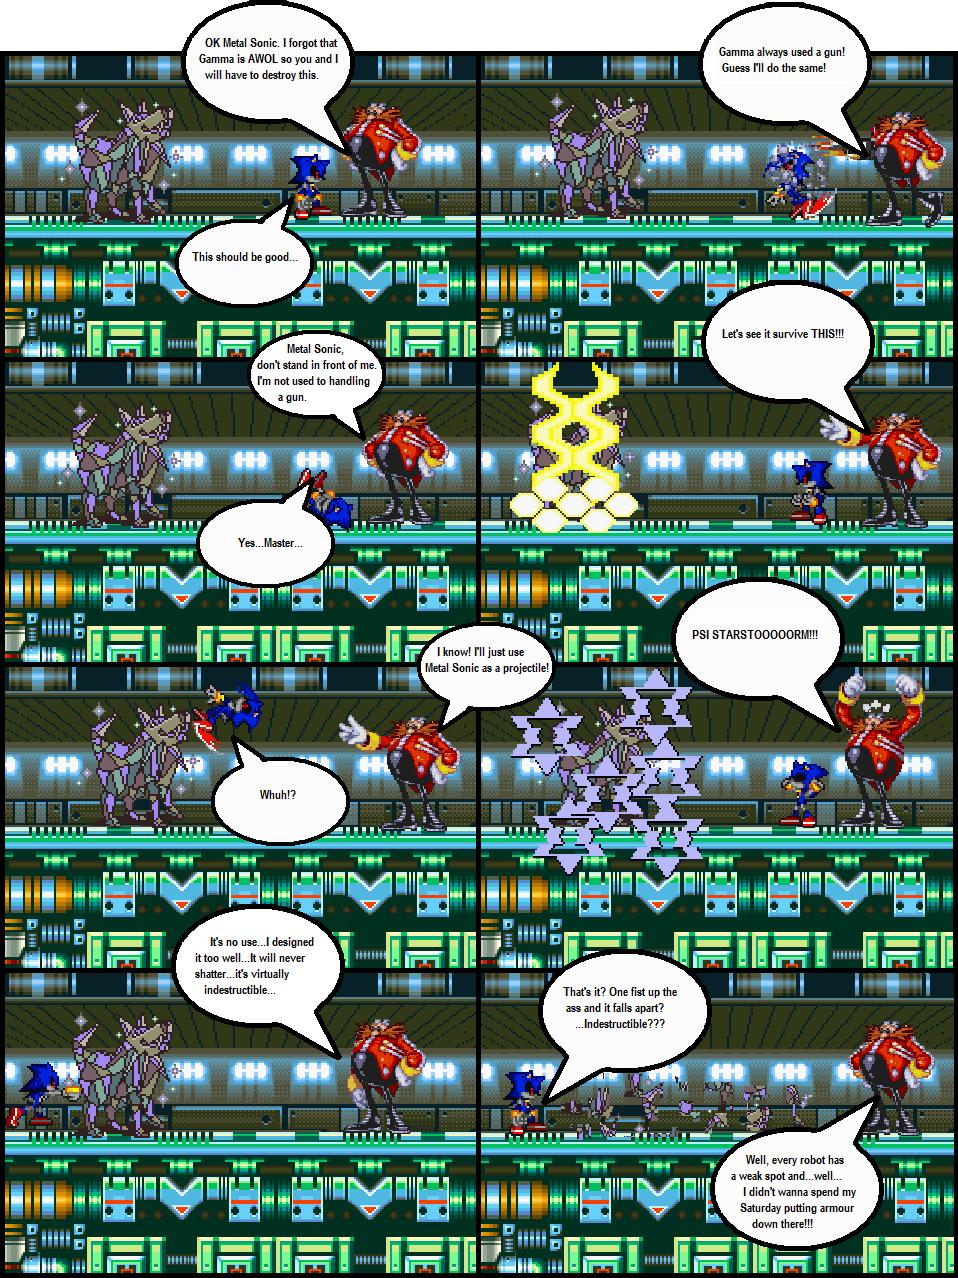 AChaoticAdventure34